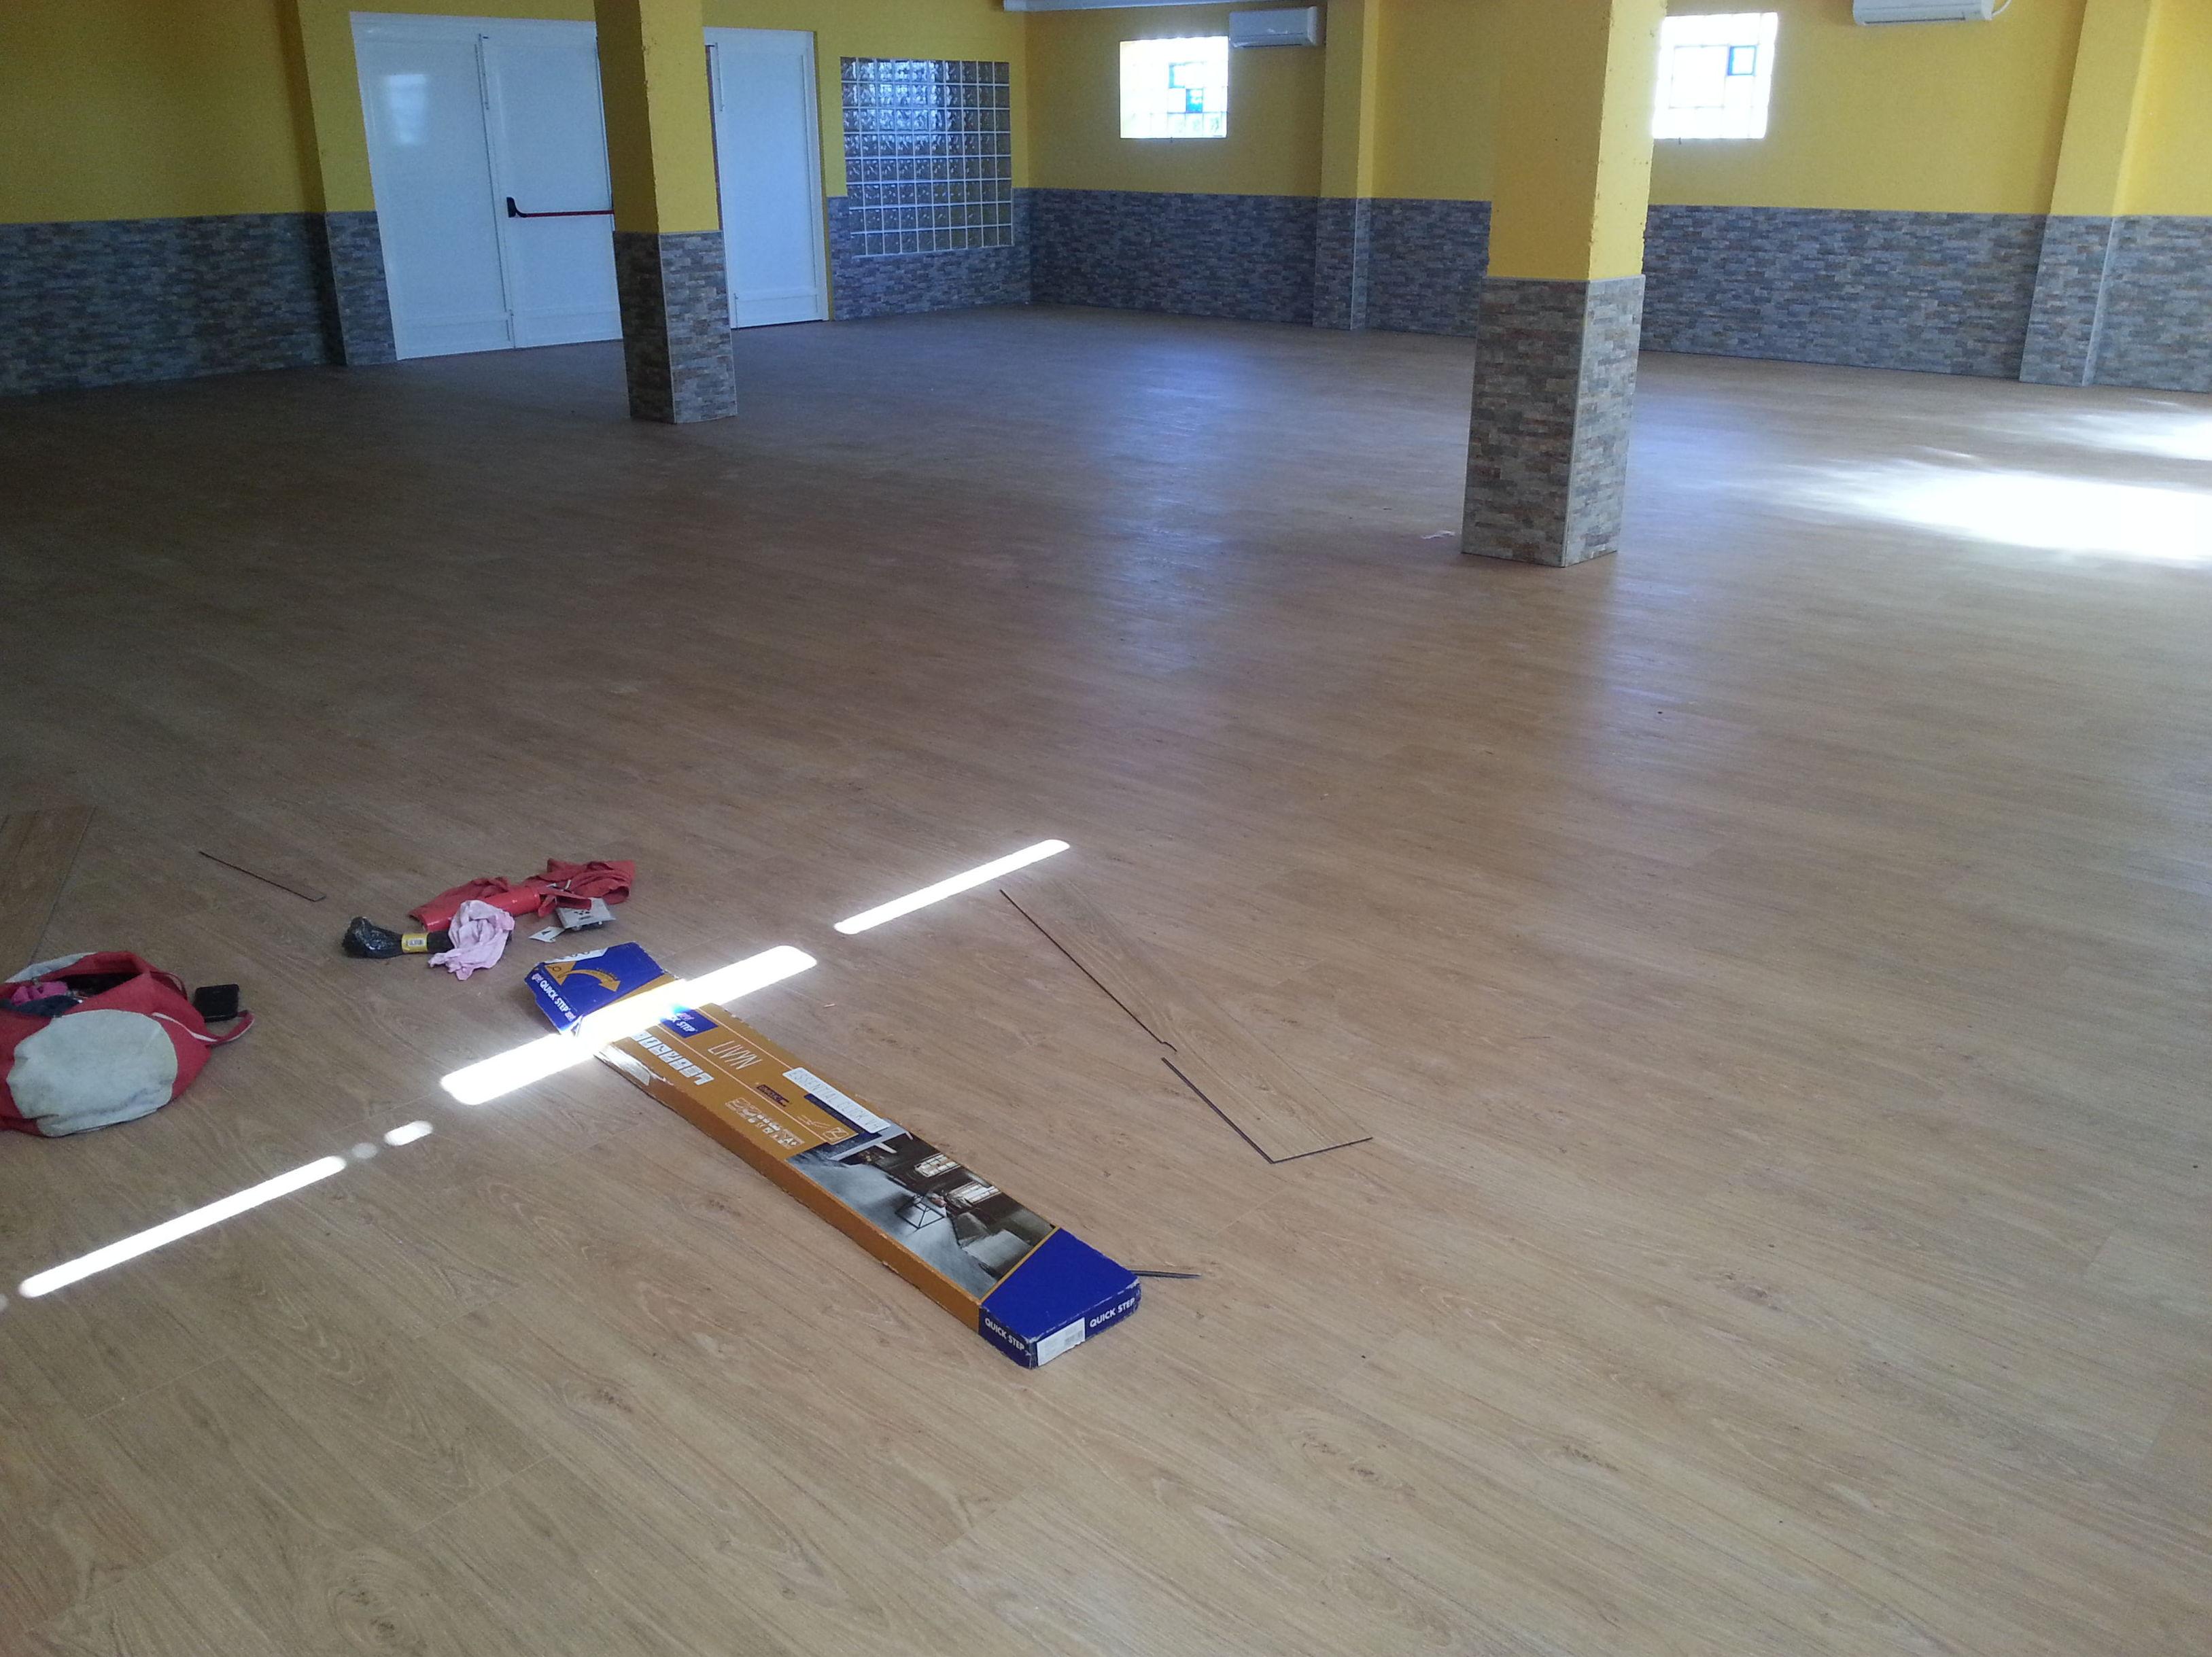 Obras en el Centro Síndrome de Down Jaén - Pavimento Vinílico QS Livyn